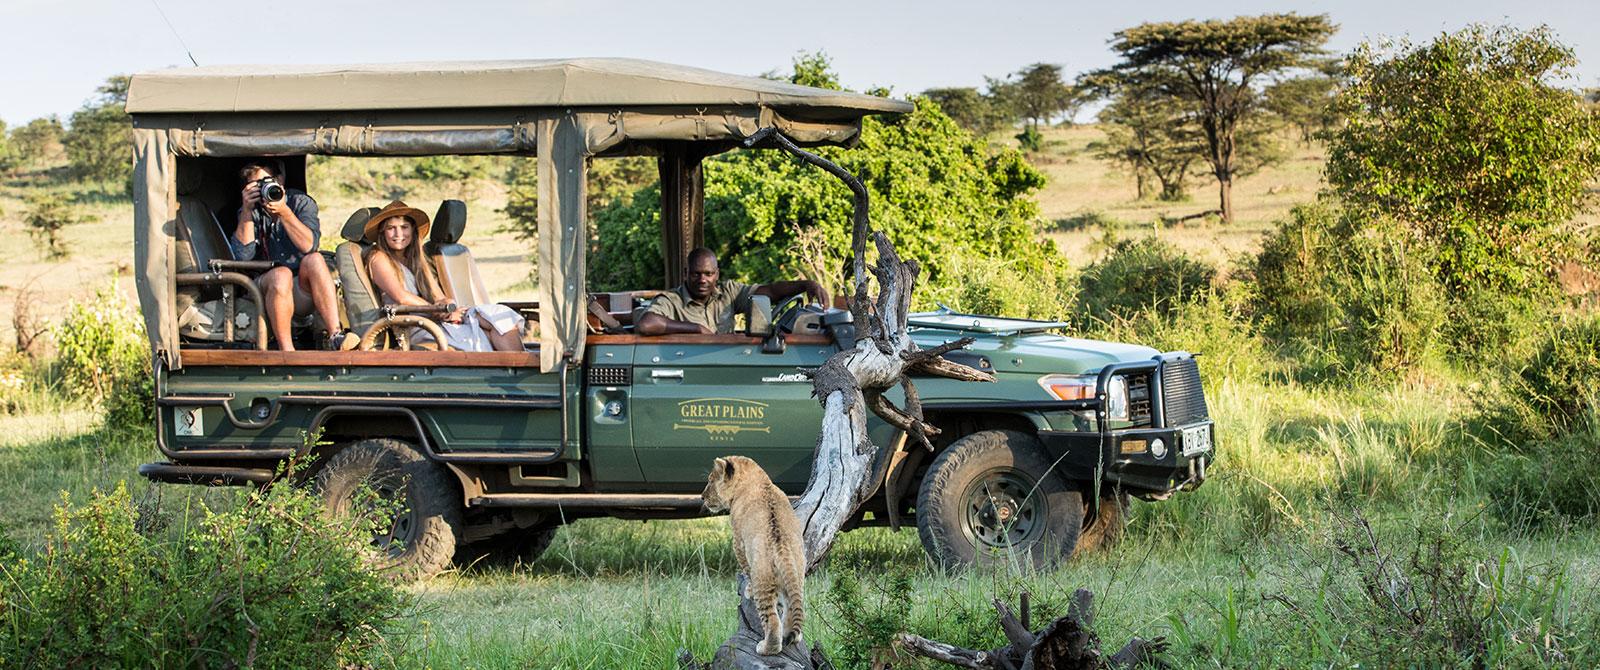 Great Plains Conservation - Mara Plains Couple on Safari